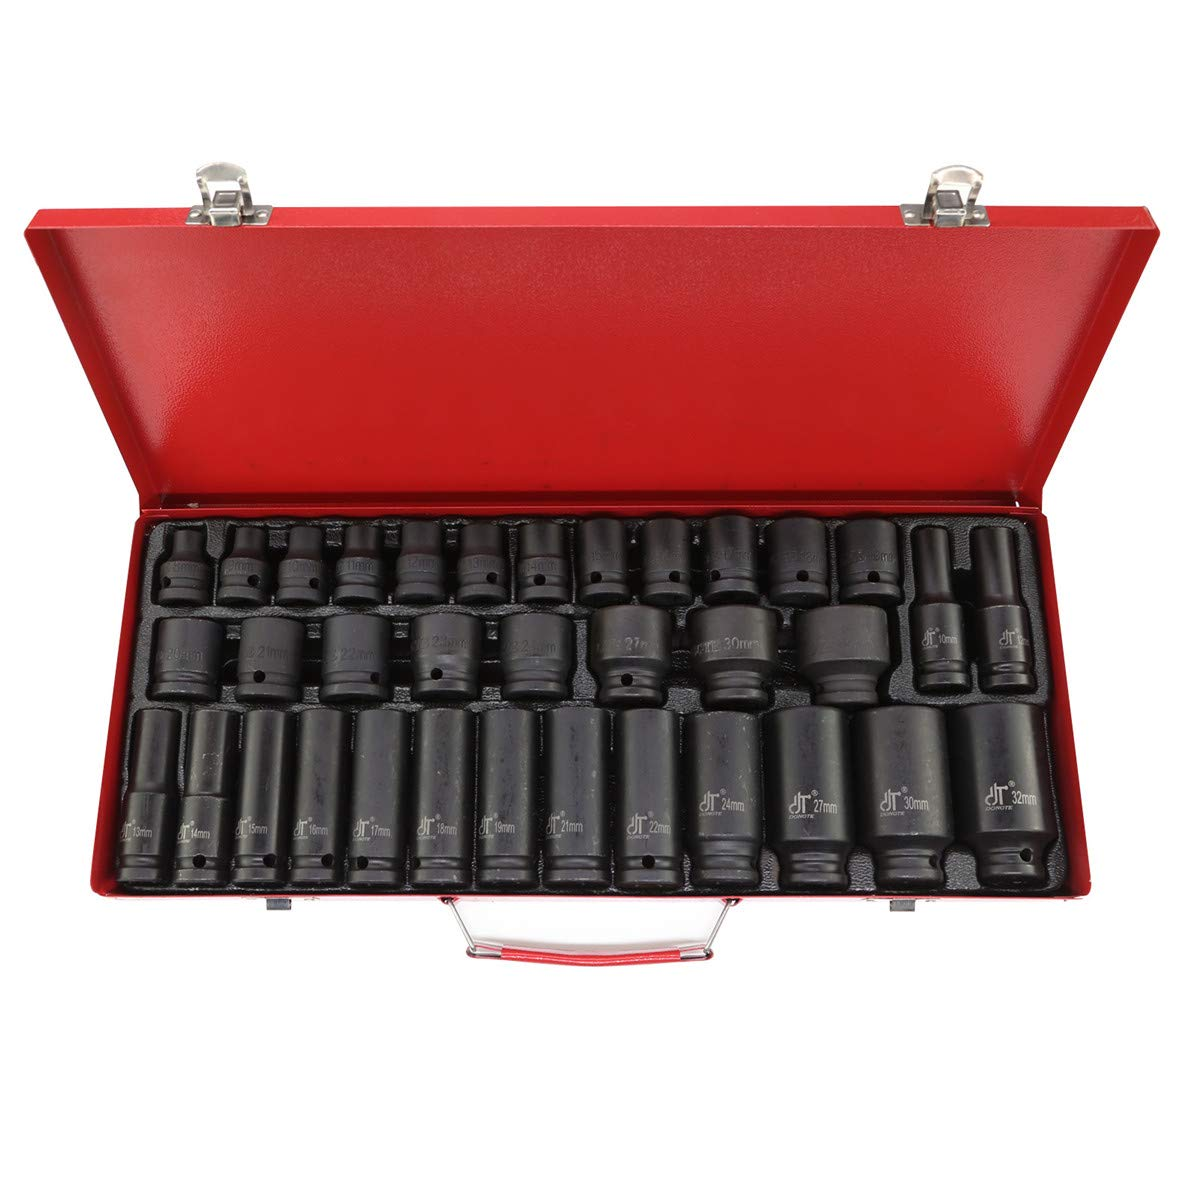 MultiWare Impact Sockets 35 Pcs 1//2 Deep Impact Socket Tool Set Metric Garage Workshop 8-32 MM